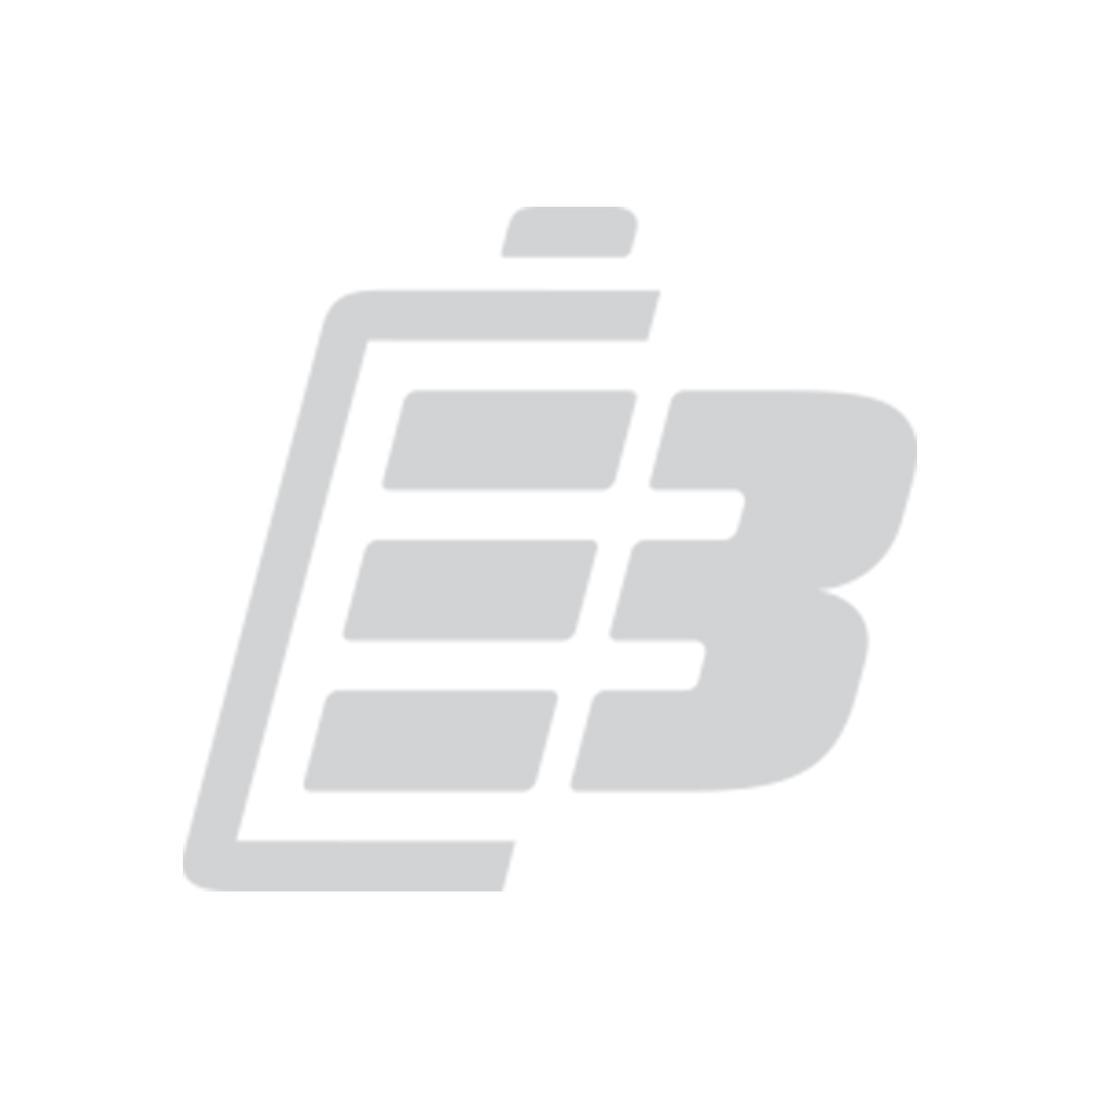 Power tool battery Makita 12V 3.0Ah_1